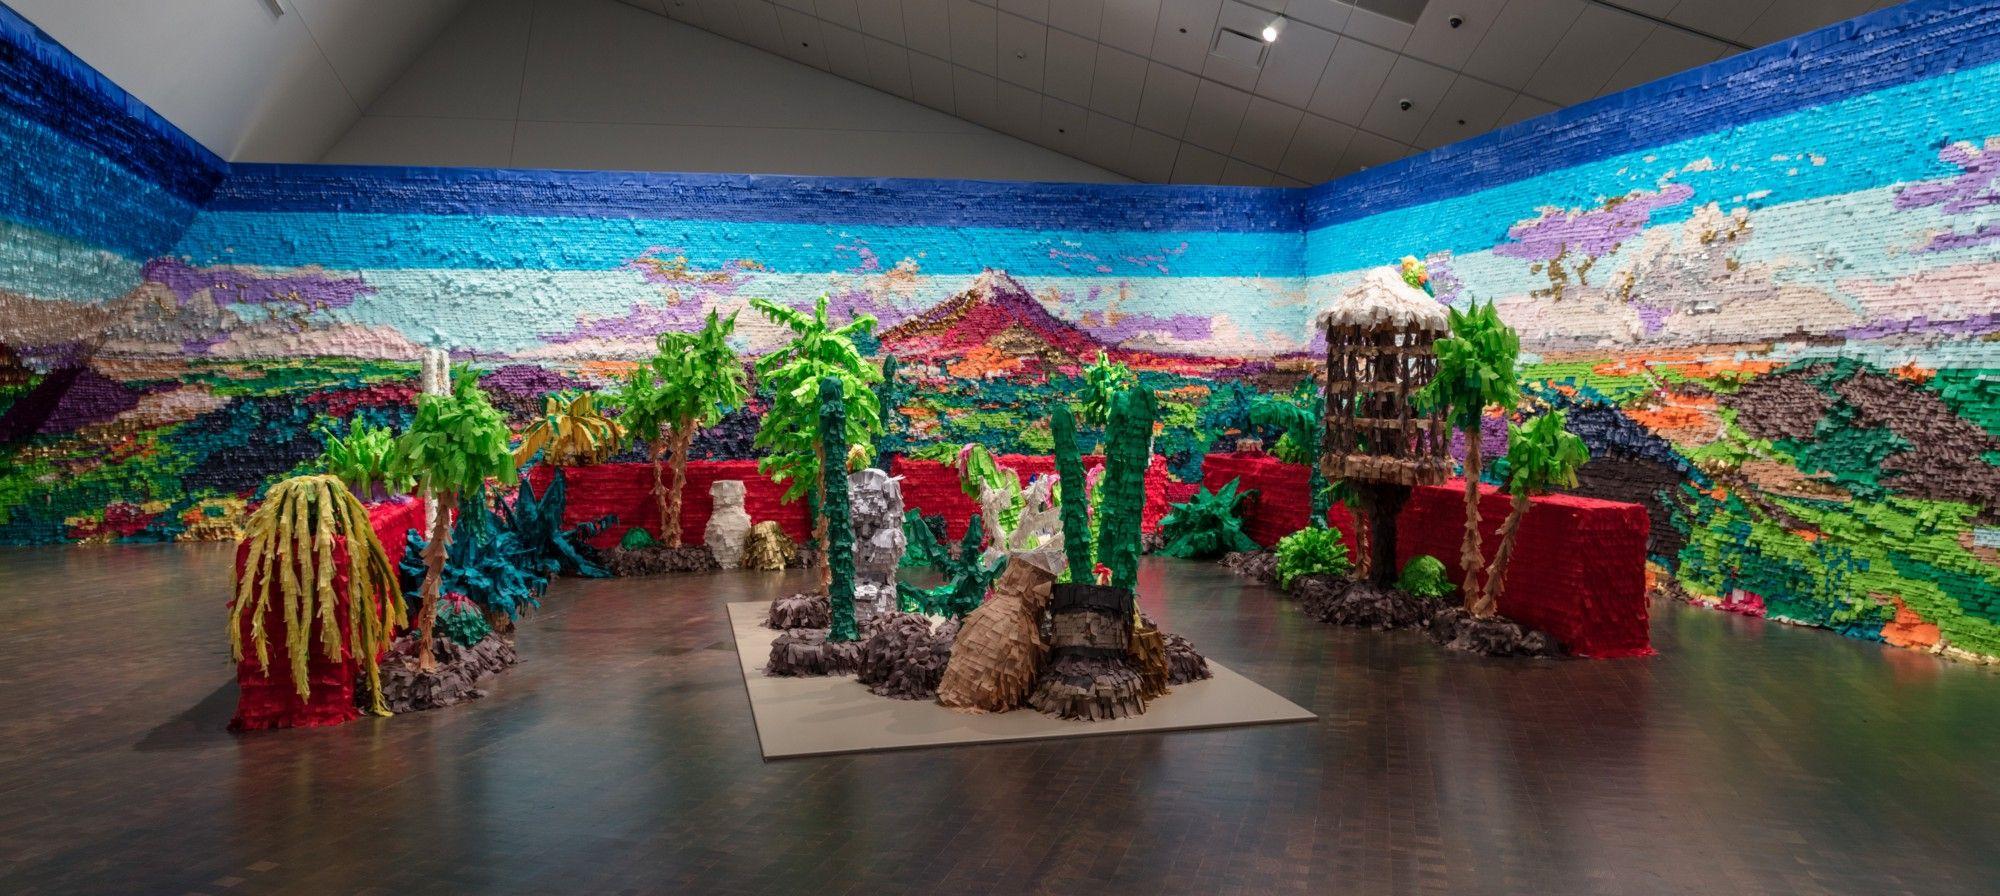 Image result for paper mache denver art museum